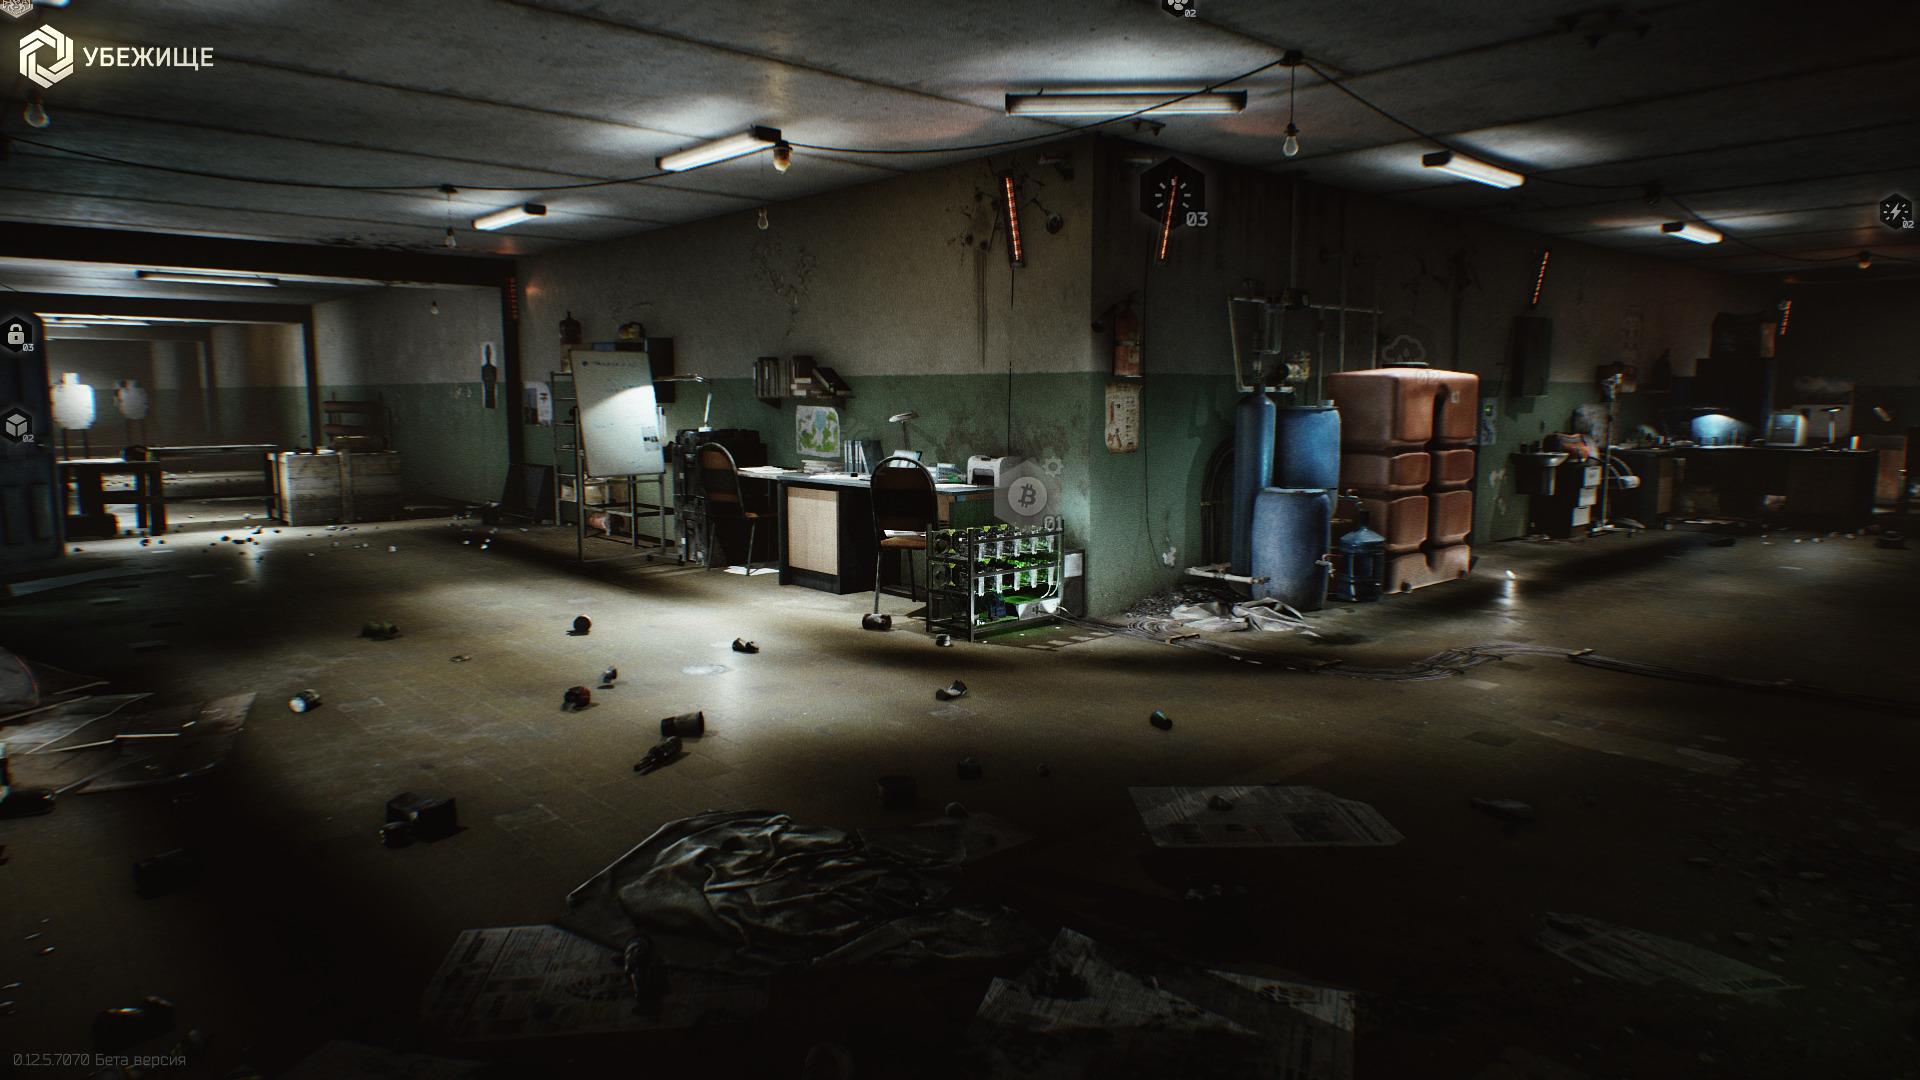 Свежий обзор Escape from Tarkov. Реализм, лут имного мата